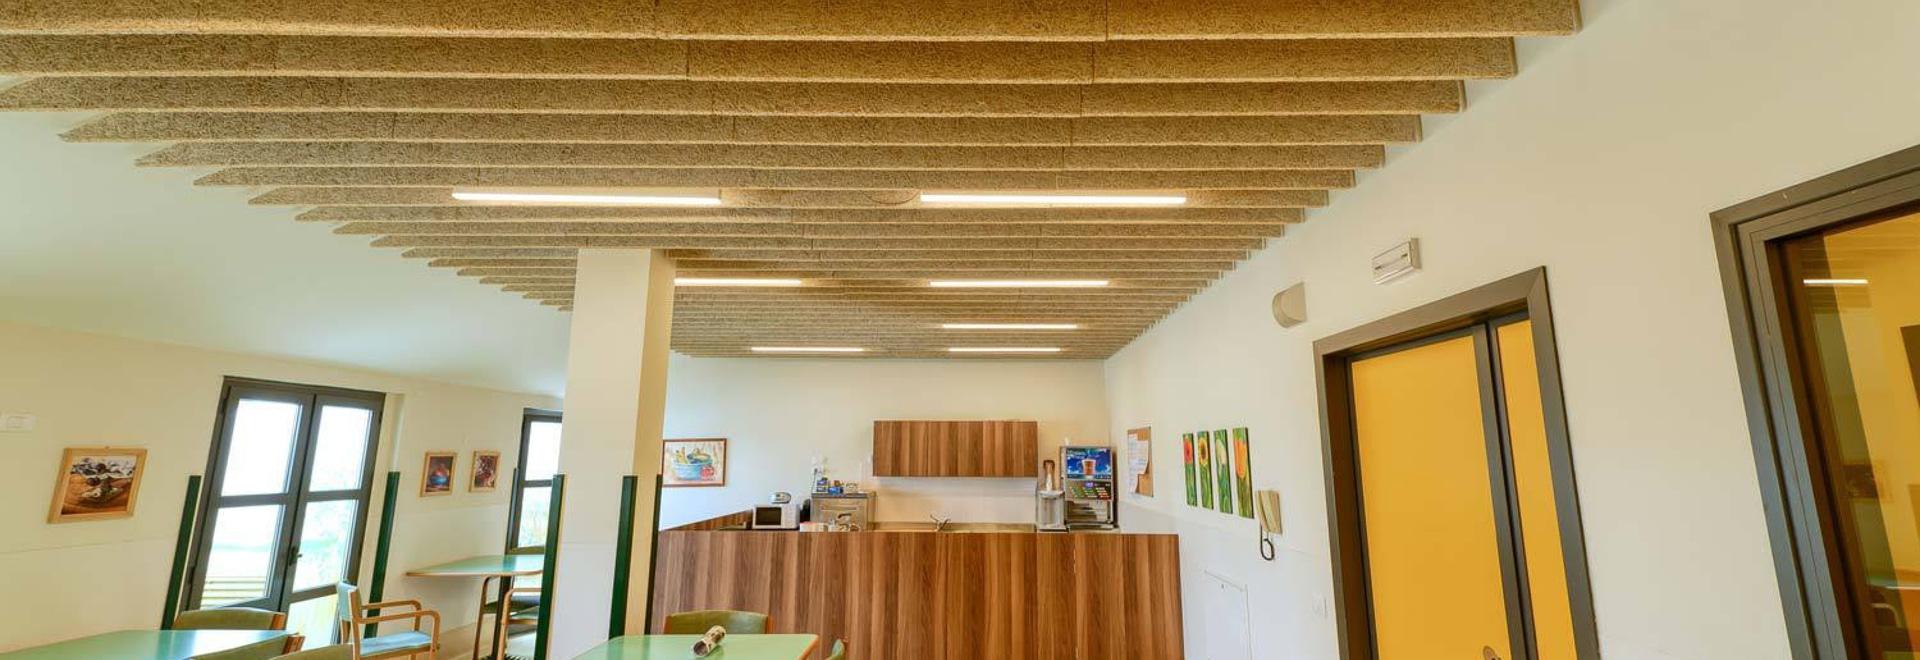 Stiftung Casa Serena Onlus | Bergamo, IT